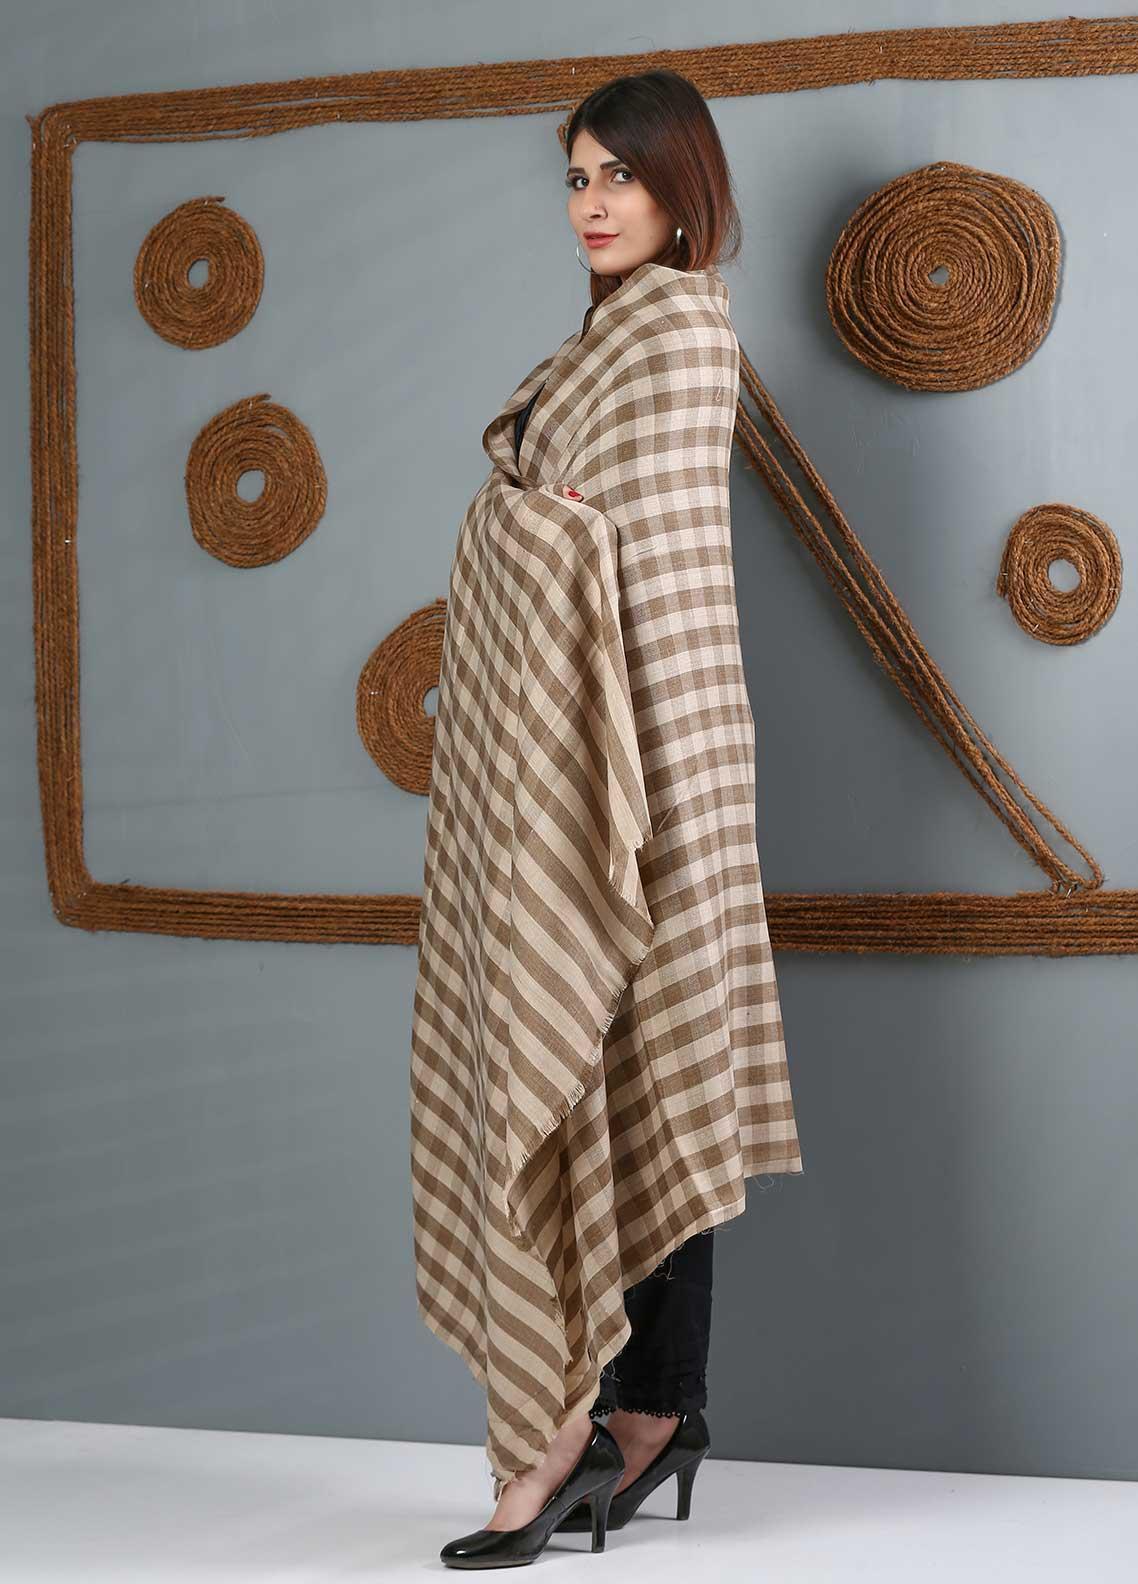 Sanaulla Exclusive Range Printed Woolen Shawl SU21WS 334167 - Woolen Shawls